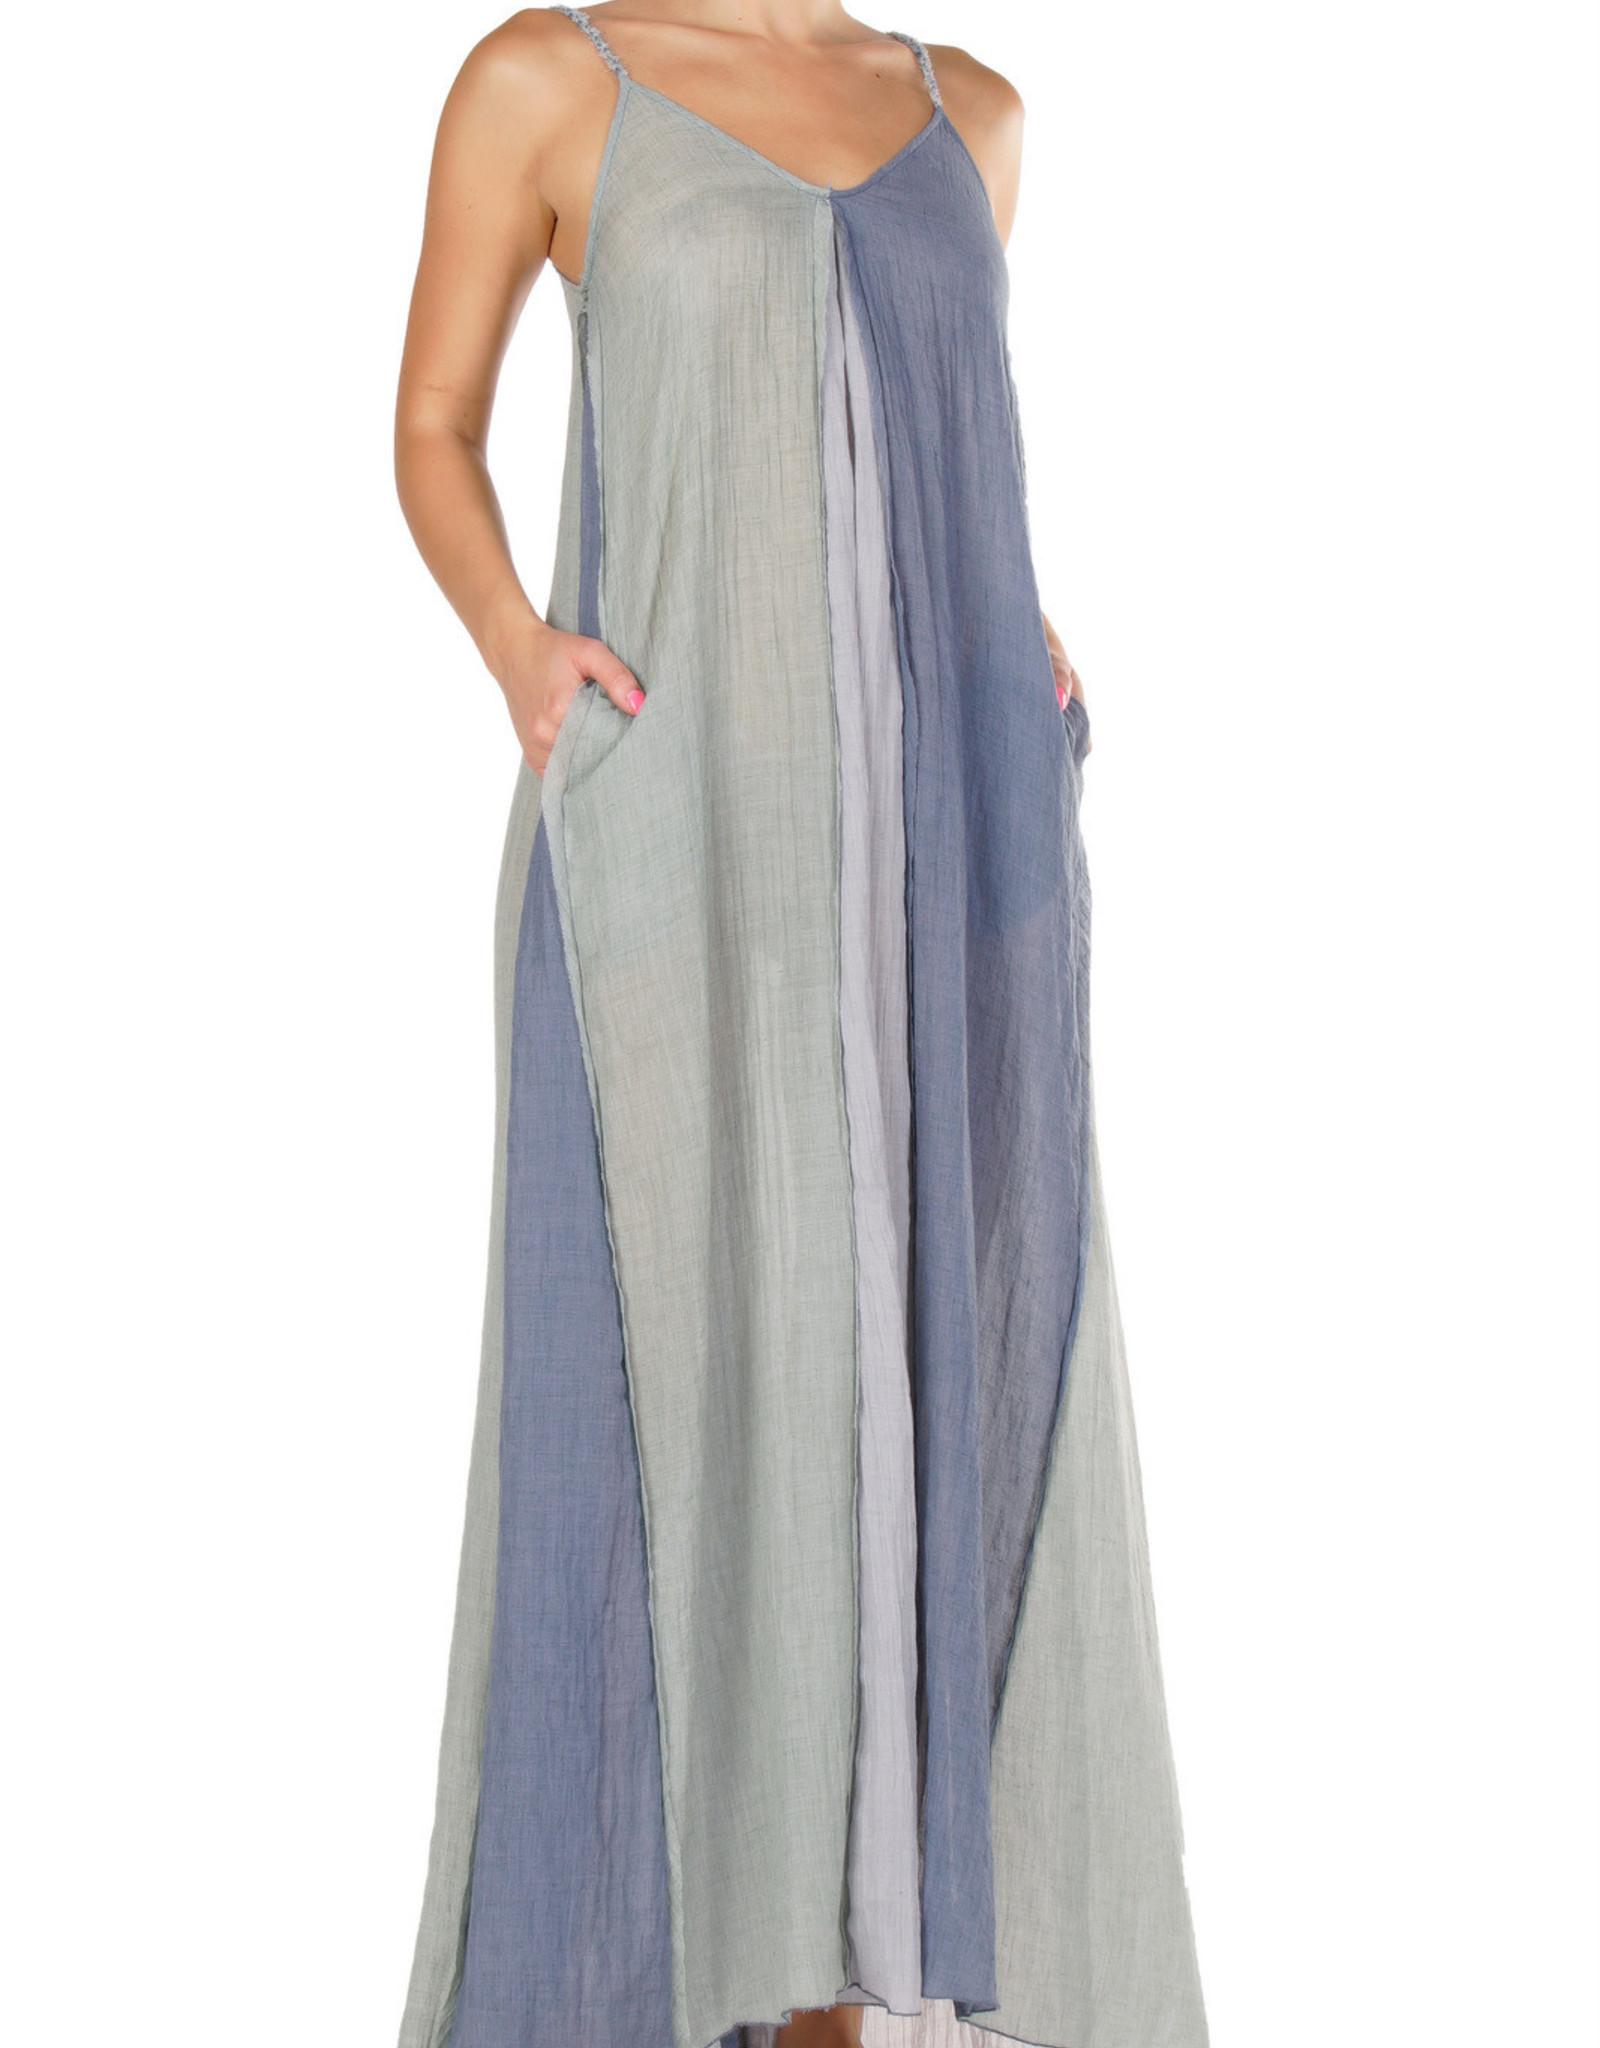 TLC MAXI DRESS